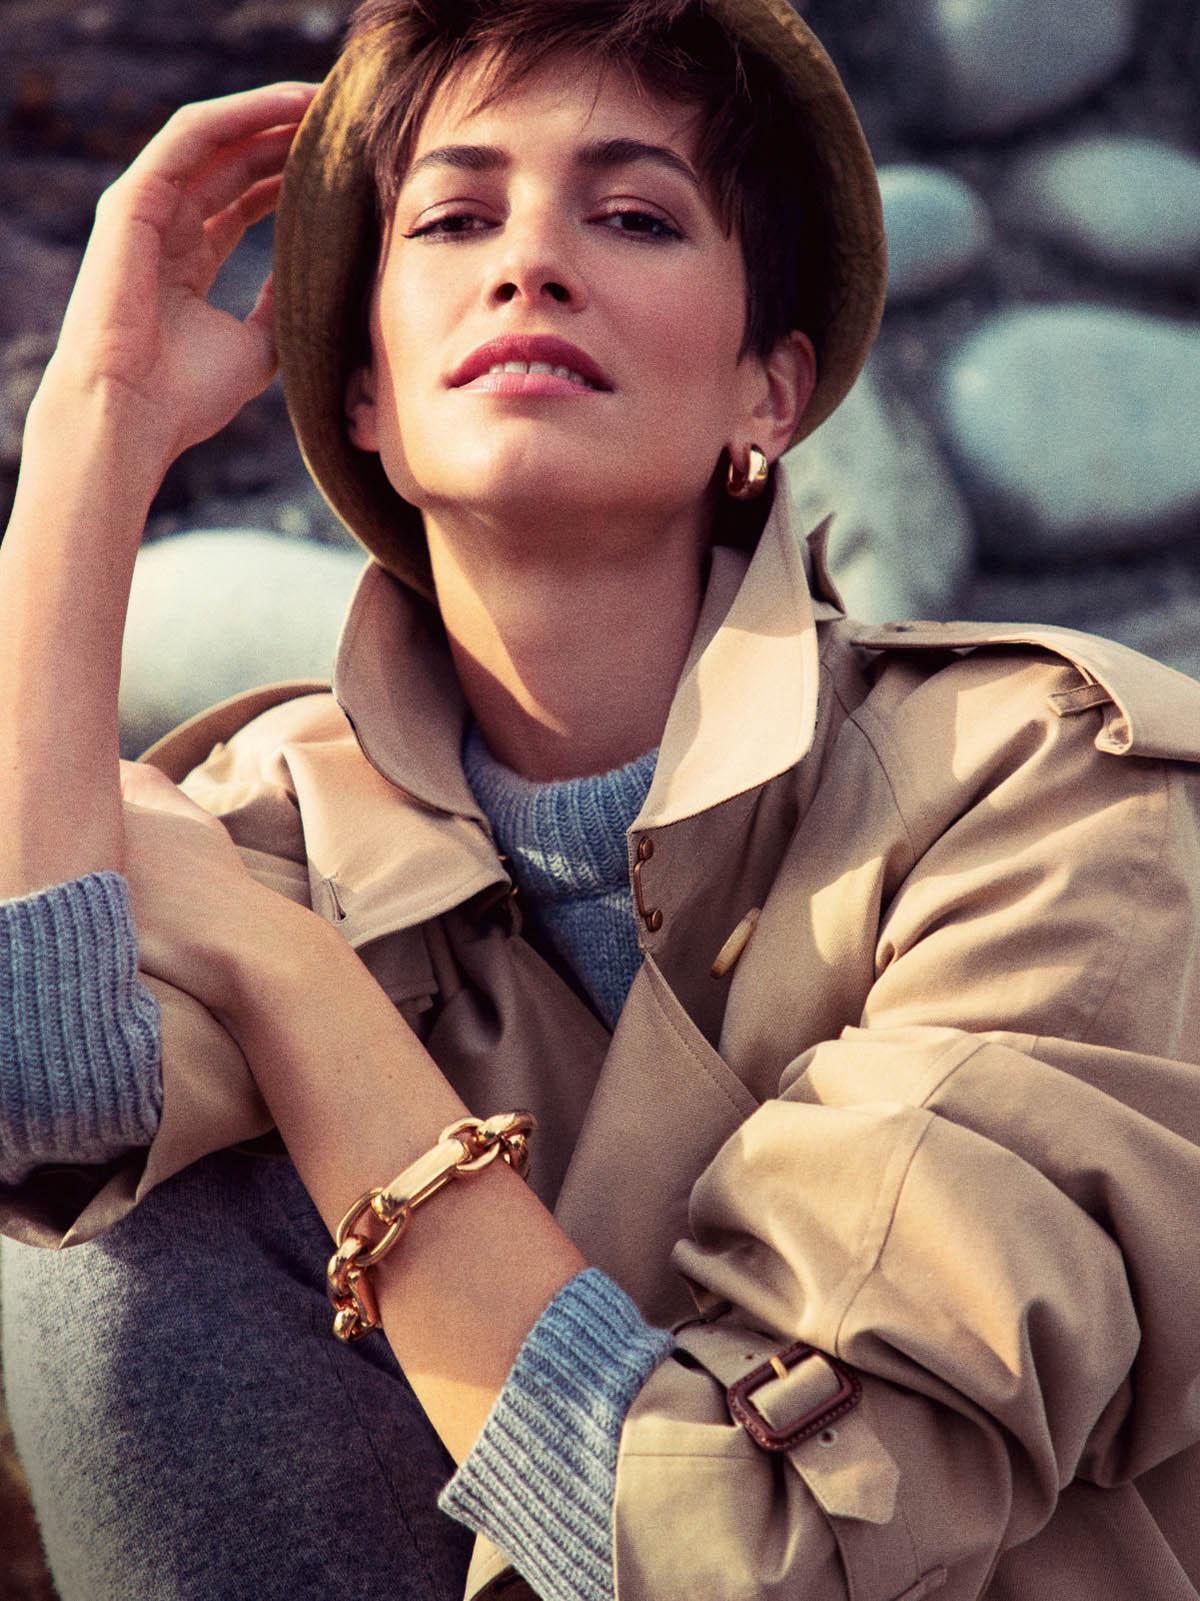 Louise de Chevigny and Malika Louback by Inez and Vinoodh for Vogue Paris February 2021